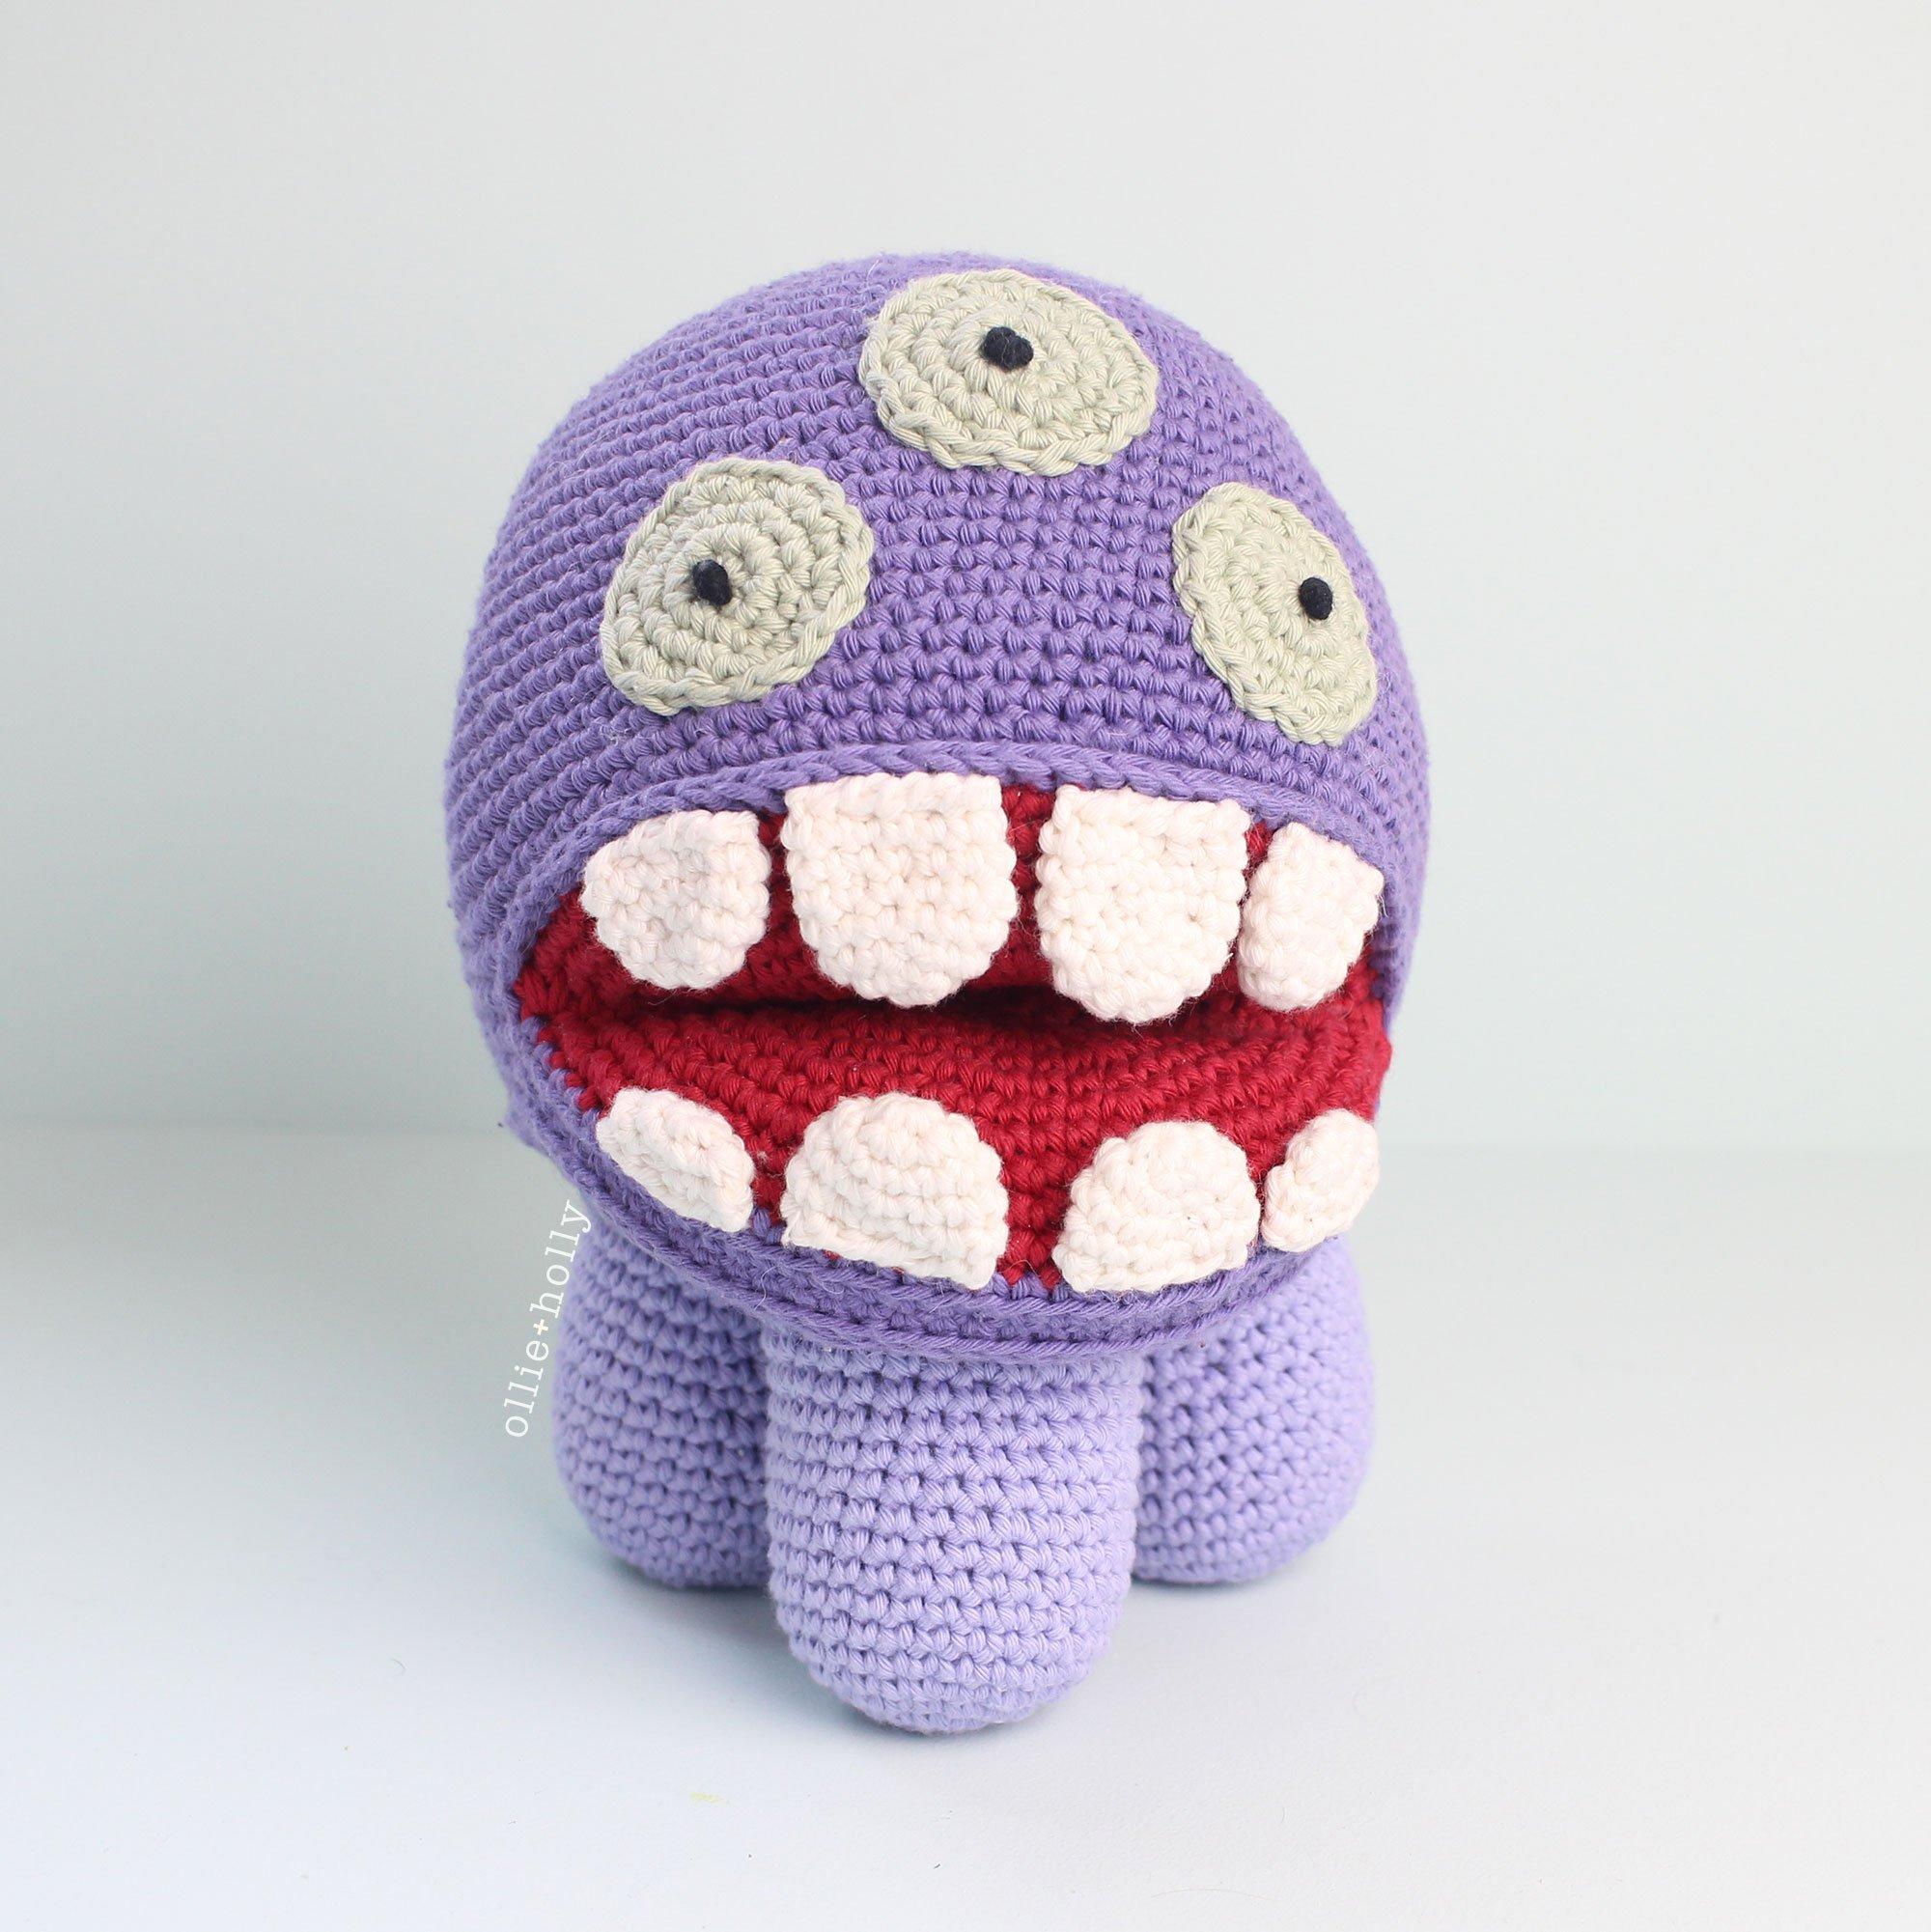 Free patterns - Page 2 - Amigurumipatterns.net | Crochet amigurumi ... | 2001x2000